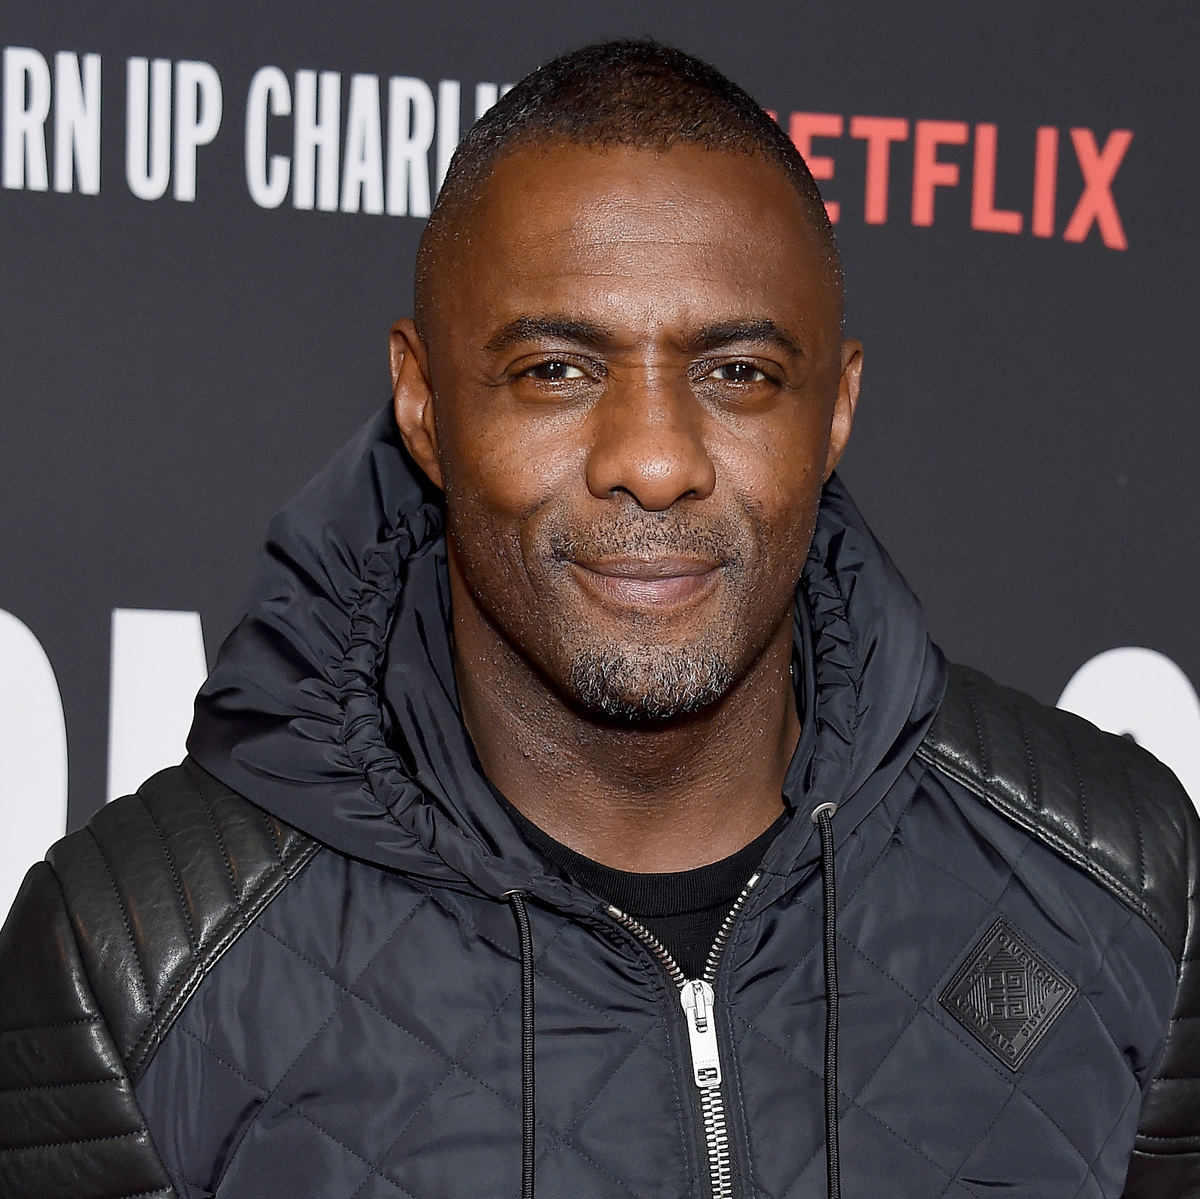 Idris Elba: 88.01 Percent Accuracy